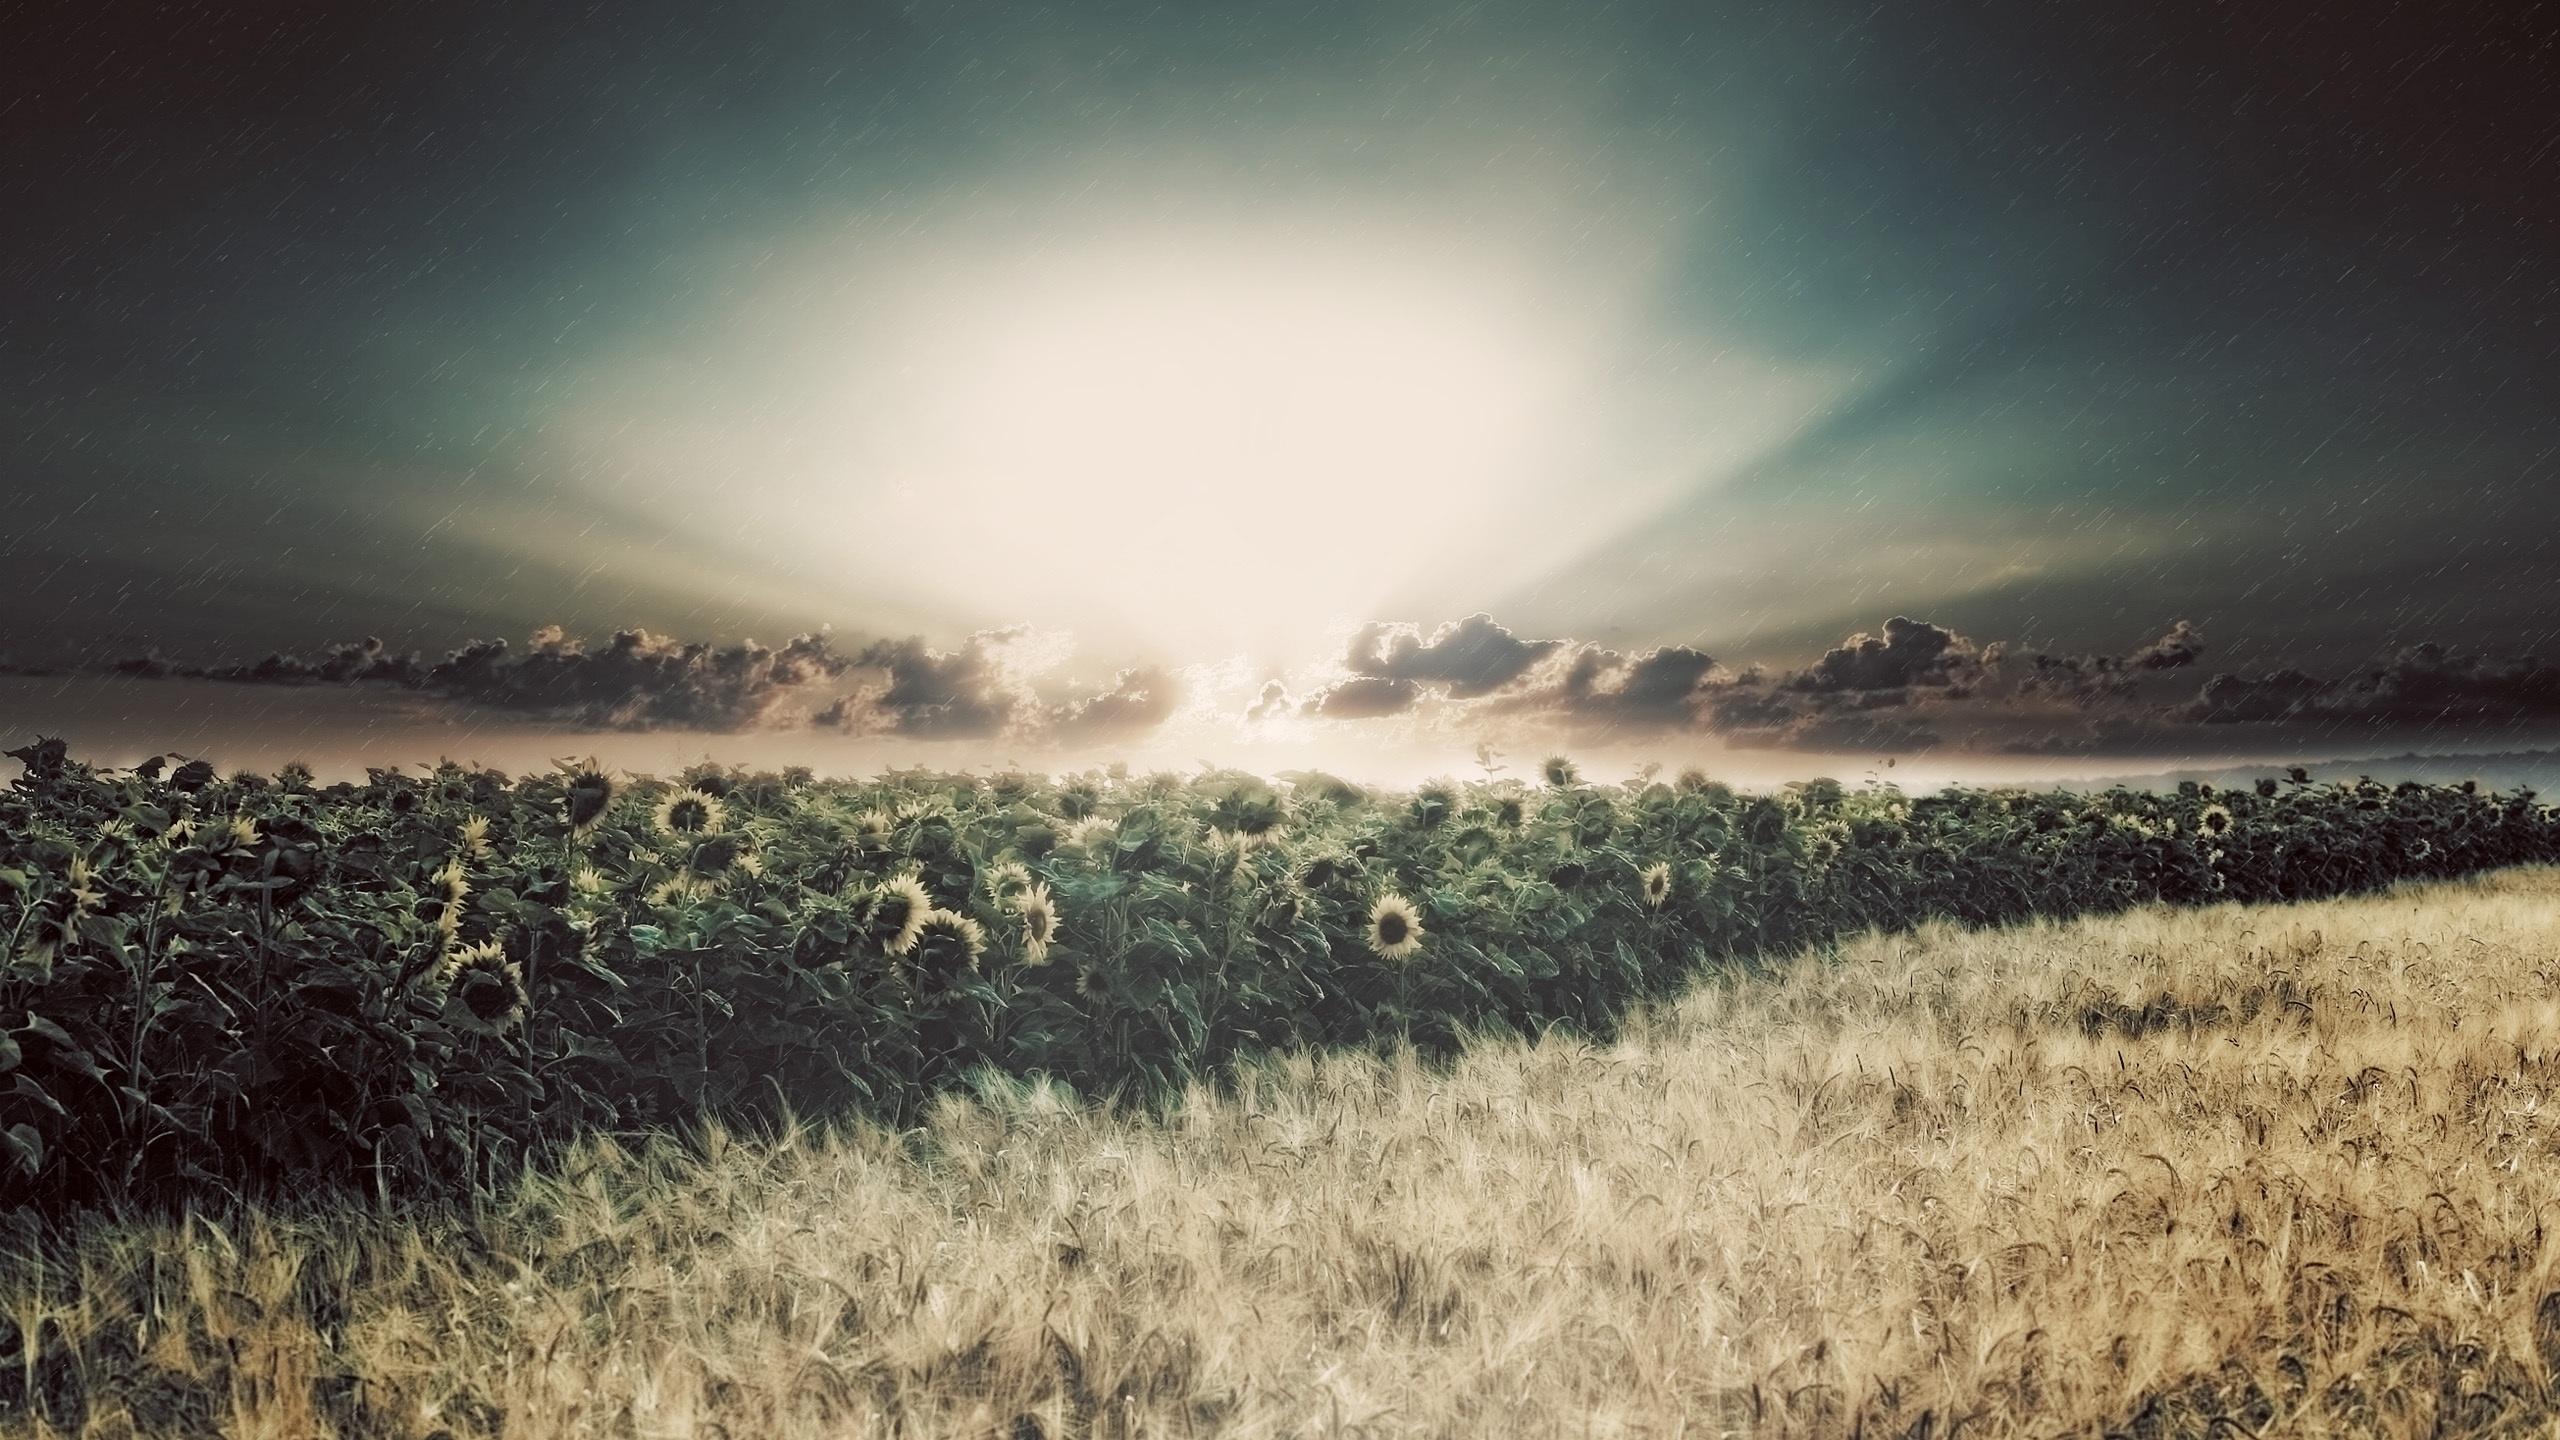 Download Wallpaper 2560x1440 Sunflowers Fields Rain